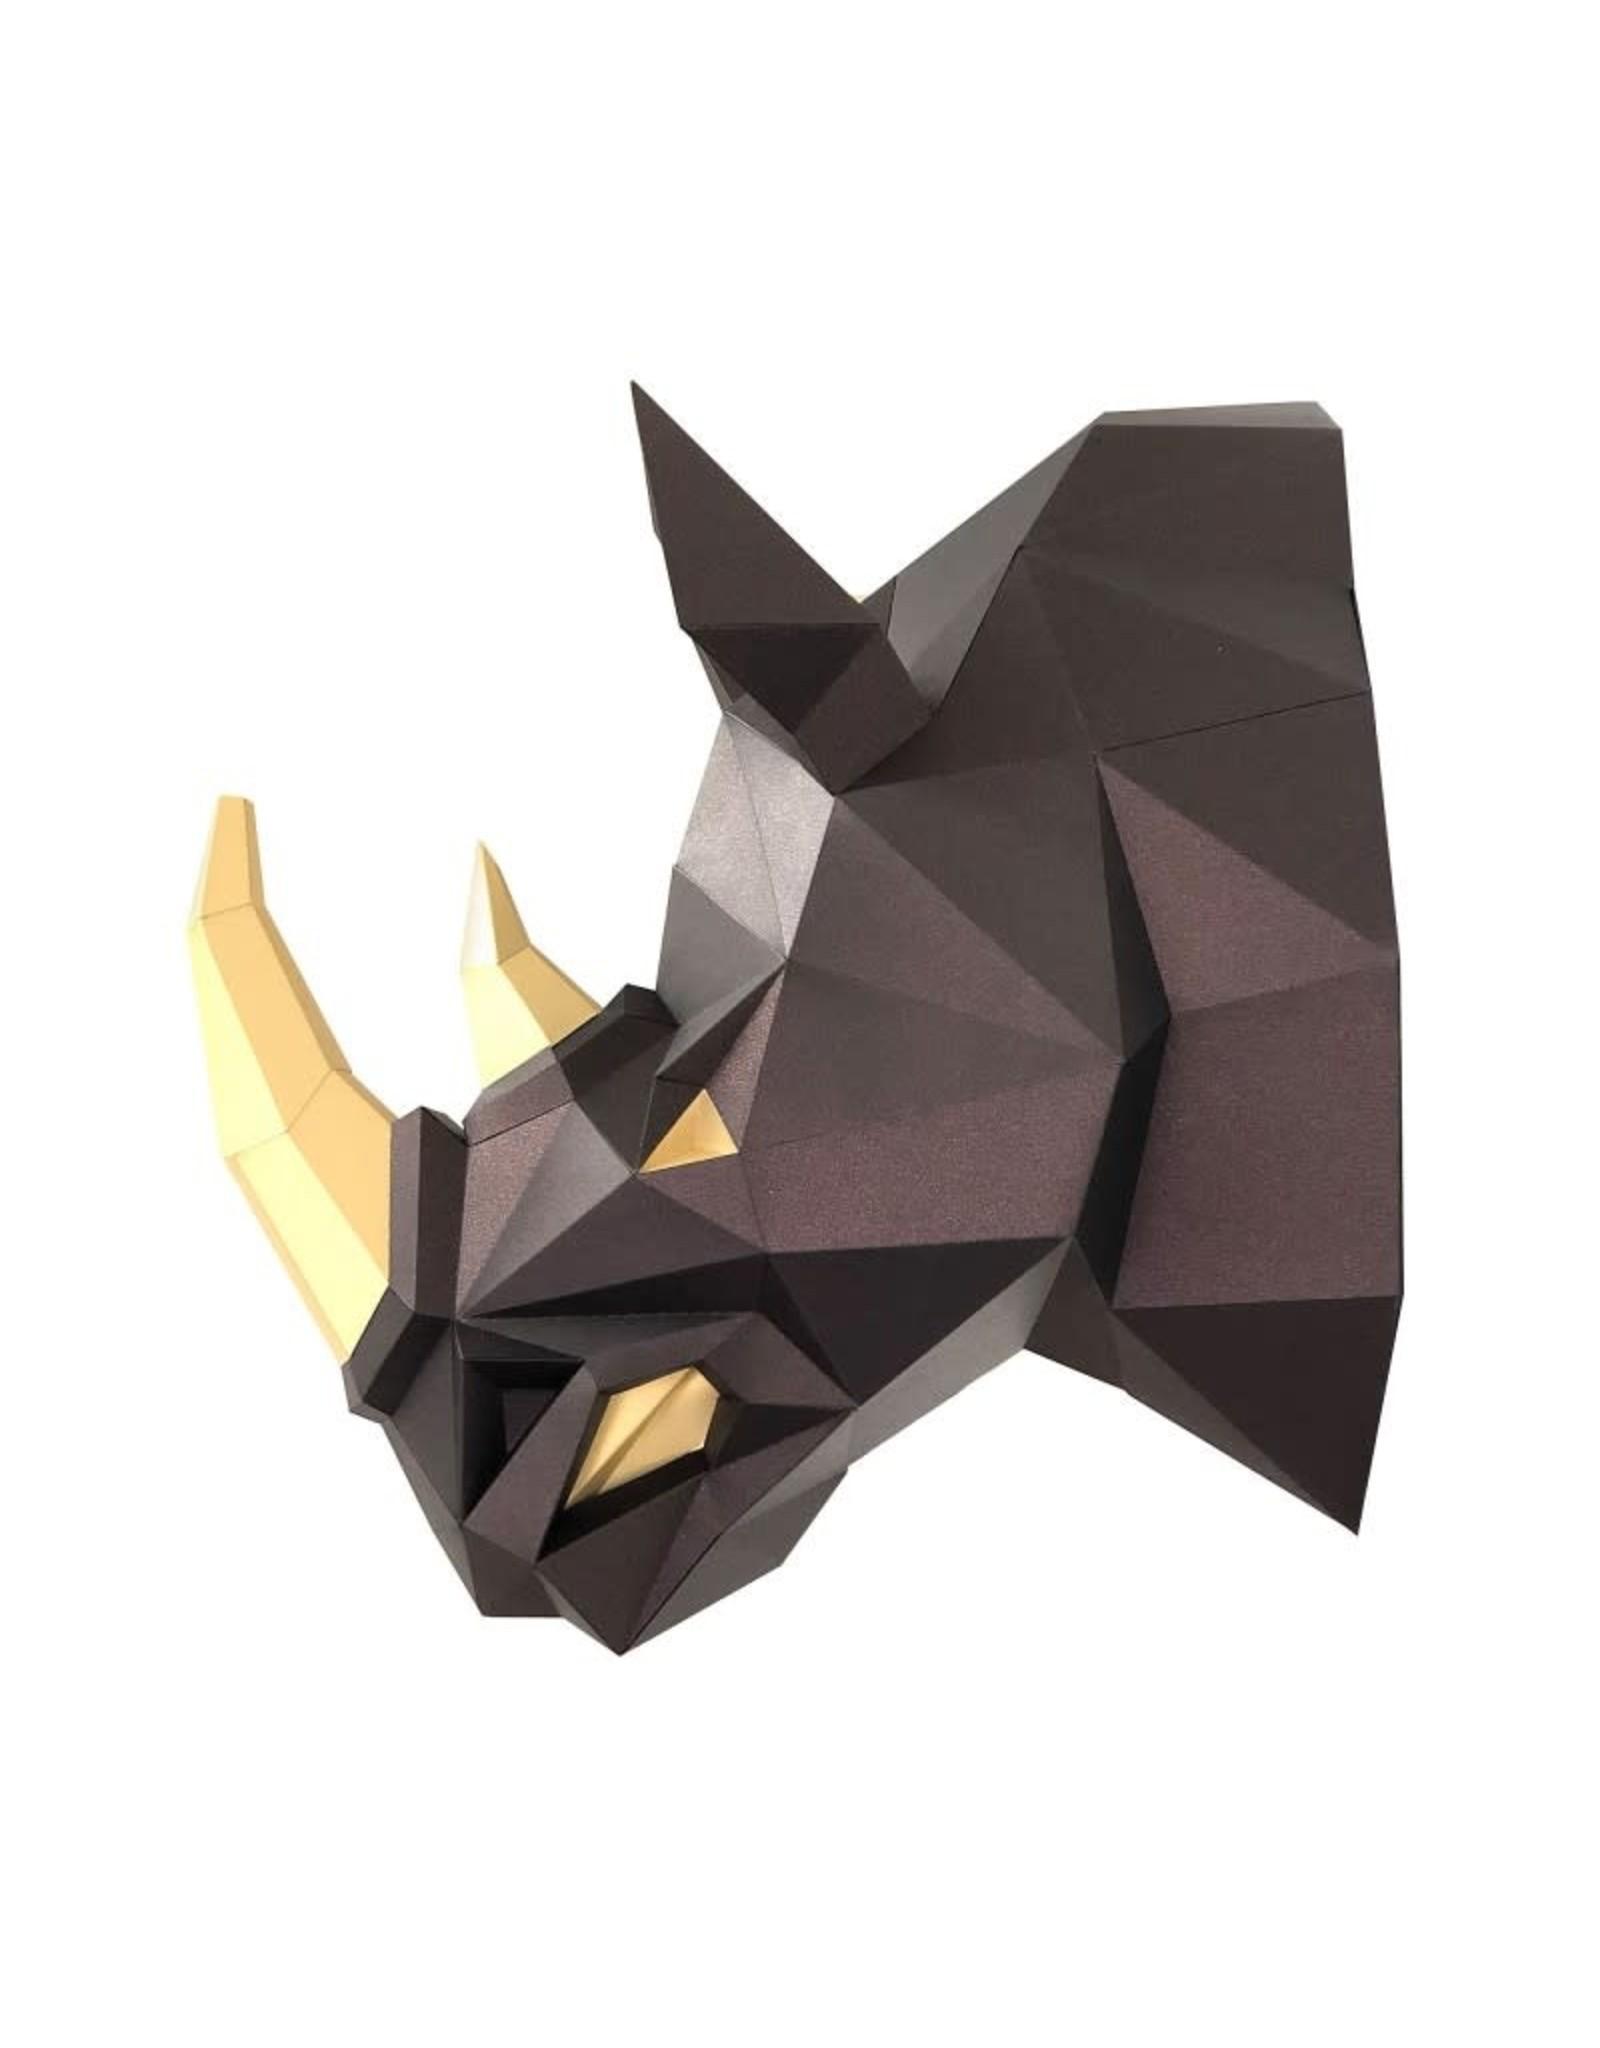 Wizardi 3d model - papercraft rhino